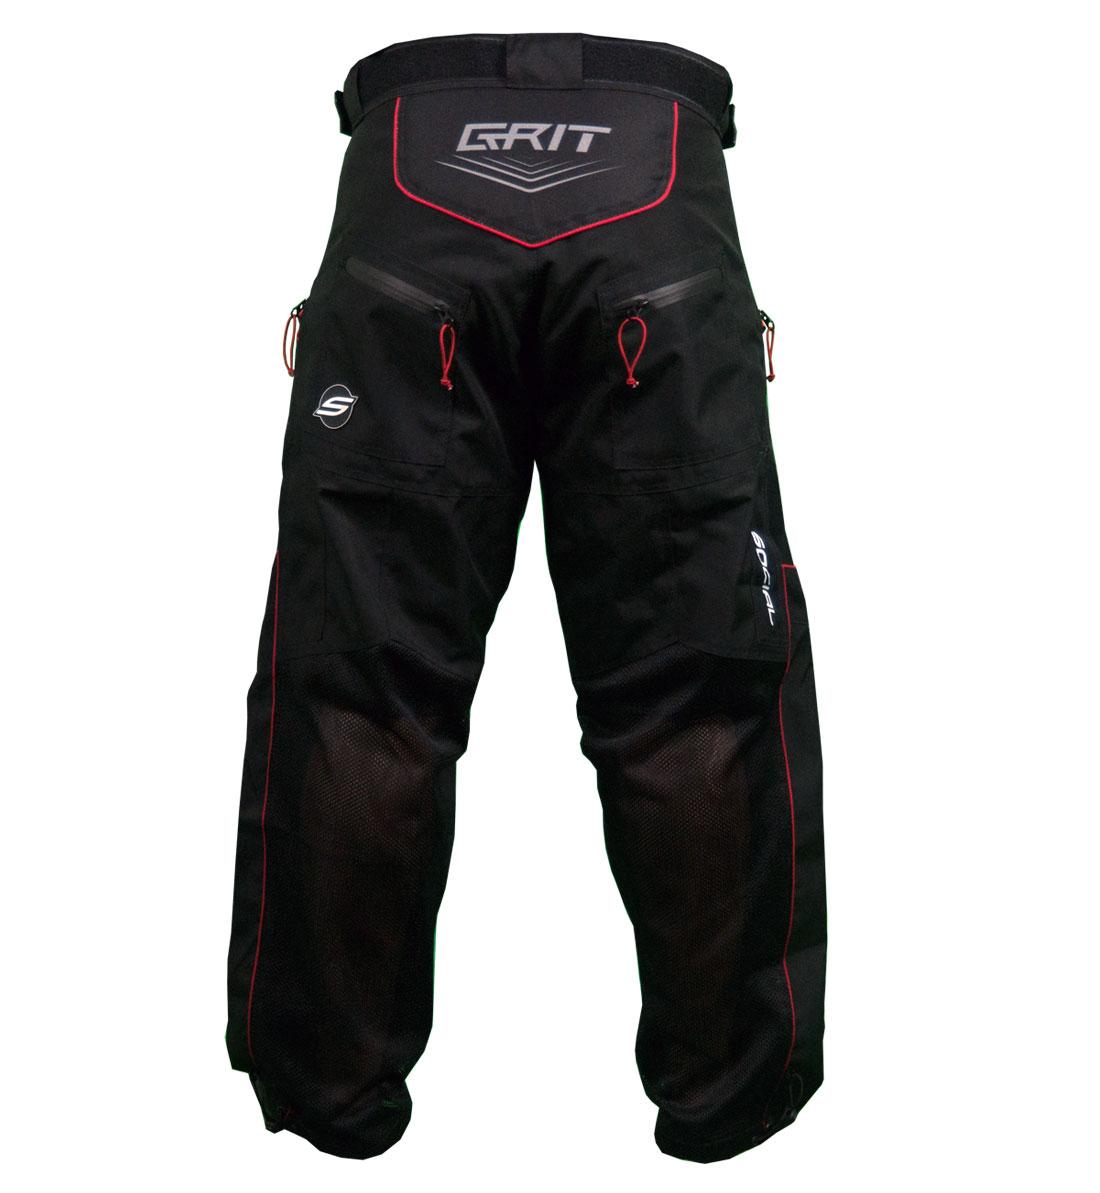 Grit V3 Paintball Pants Black Red Social Paintball